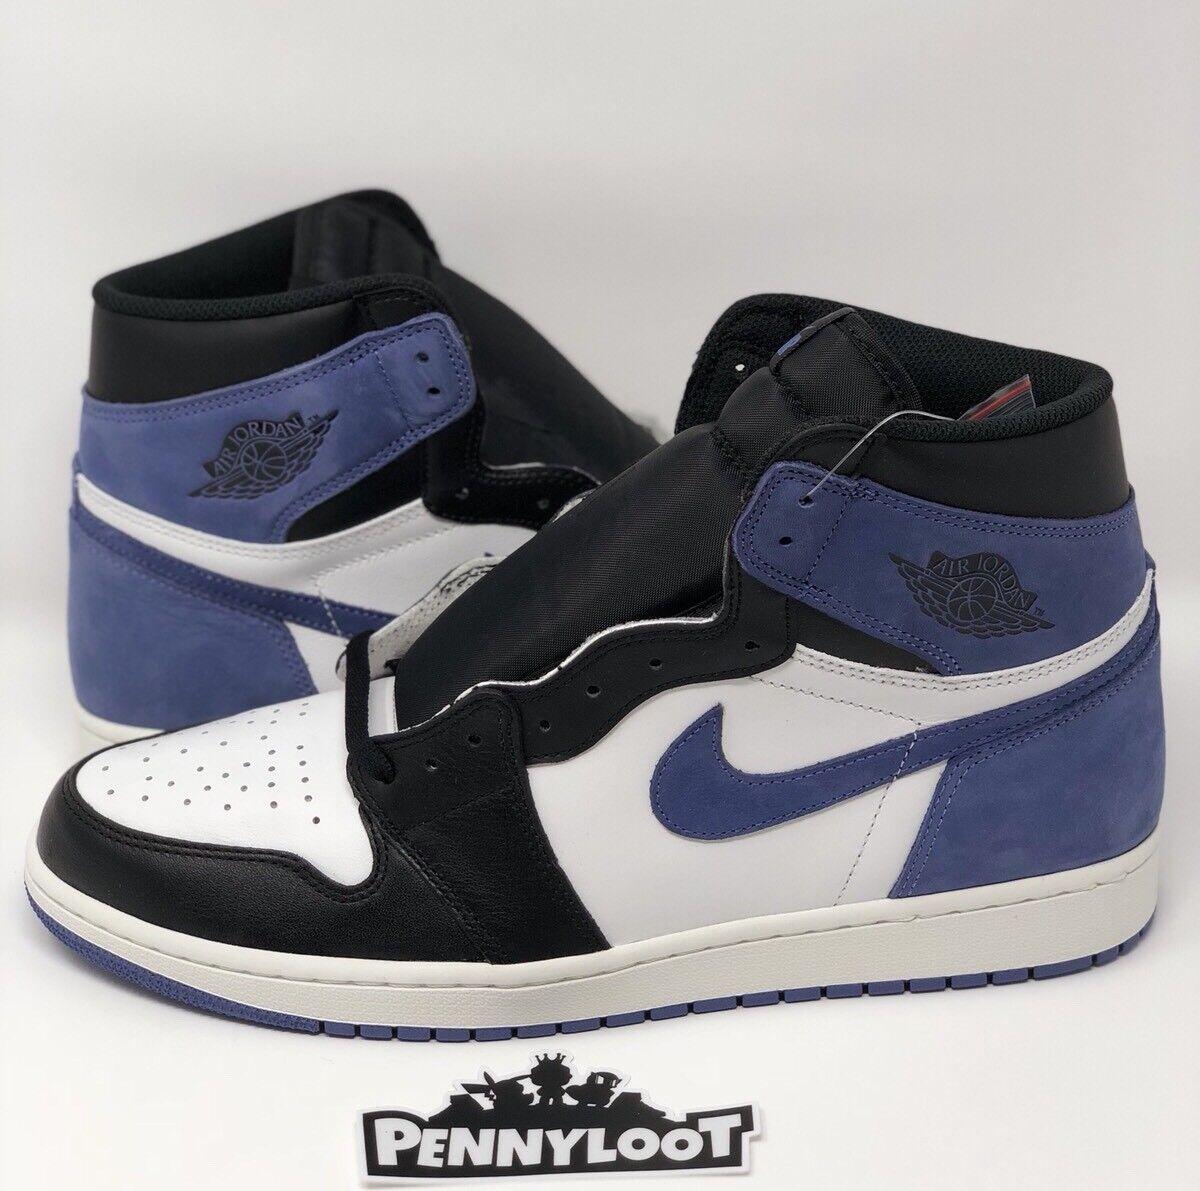 Nike Air Jordan 1 High OG Blue Moon Size 13 Bred Toe Royal Shadow Top 3 Gold Toe